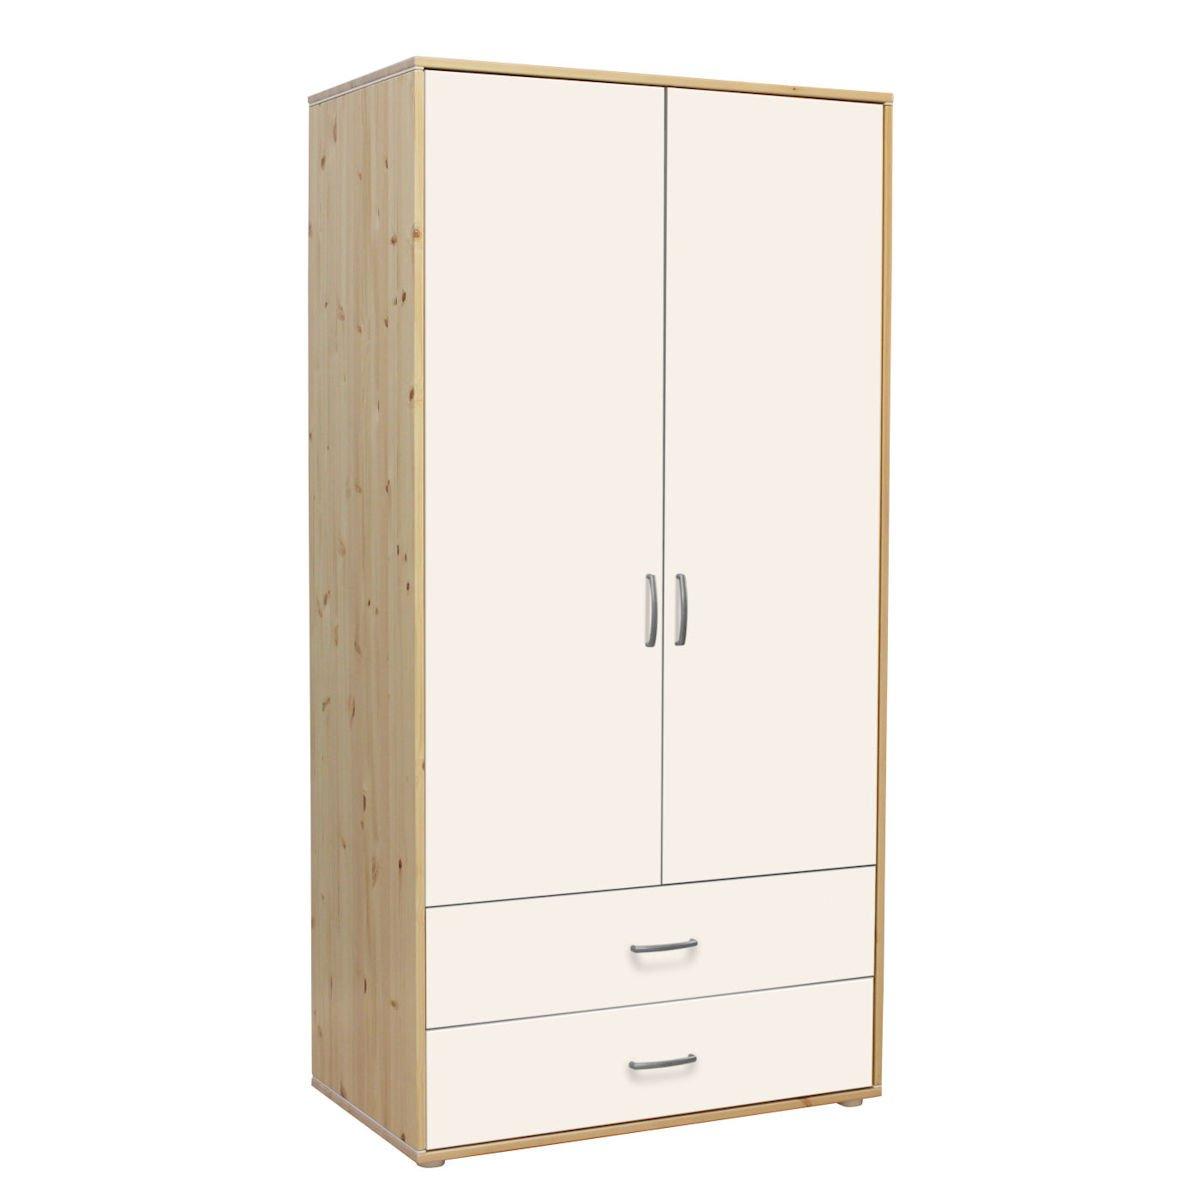 kleiderschrank 2 sch be 2 t kiefer lack wei wei 714. Black Bedroom Furniture Sets. Home Design Ideas